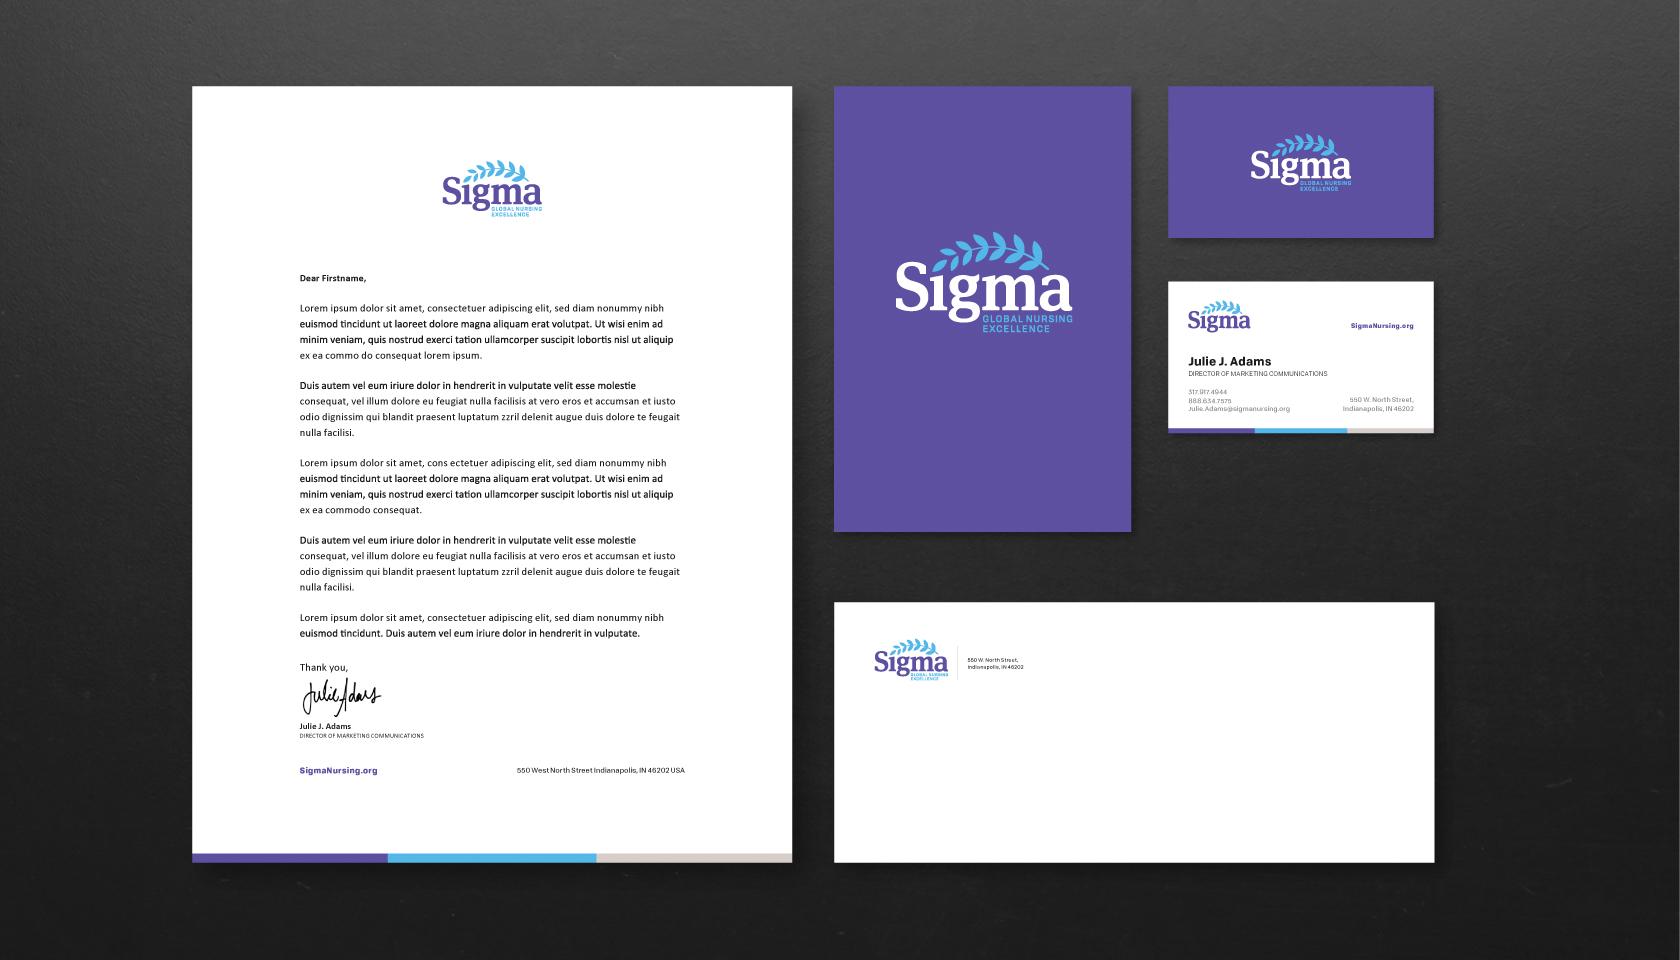 Sigma brand samples